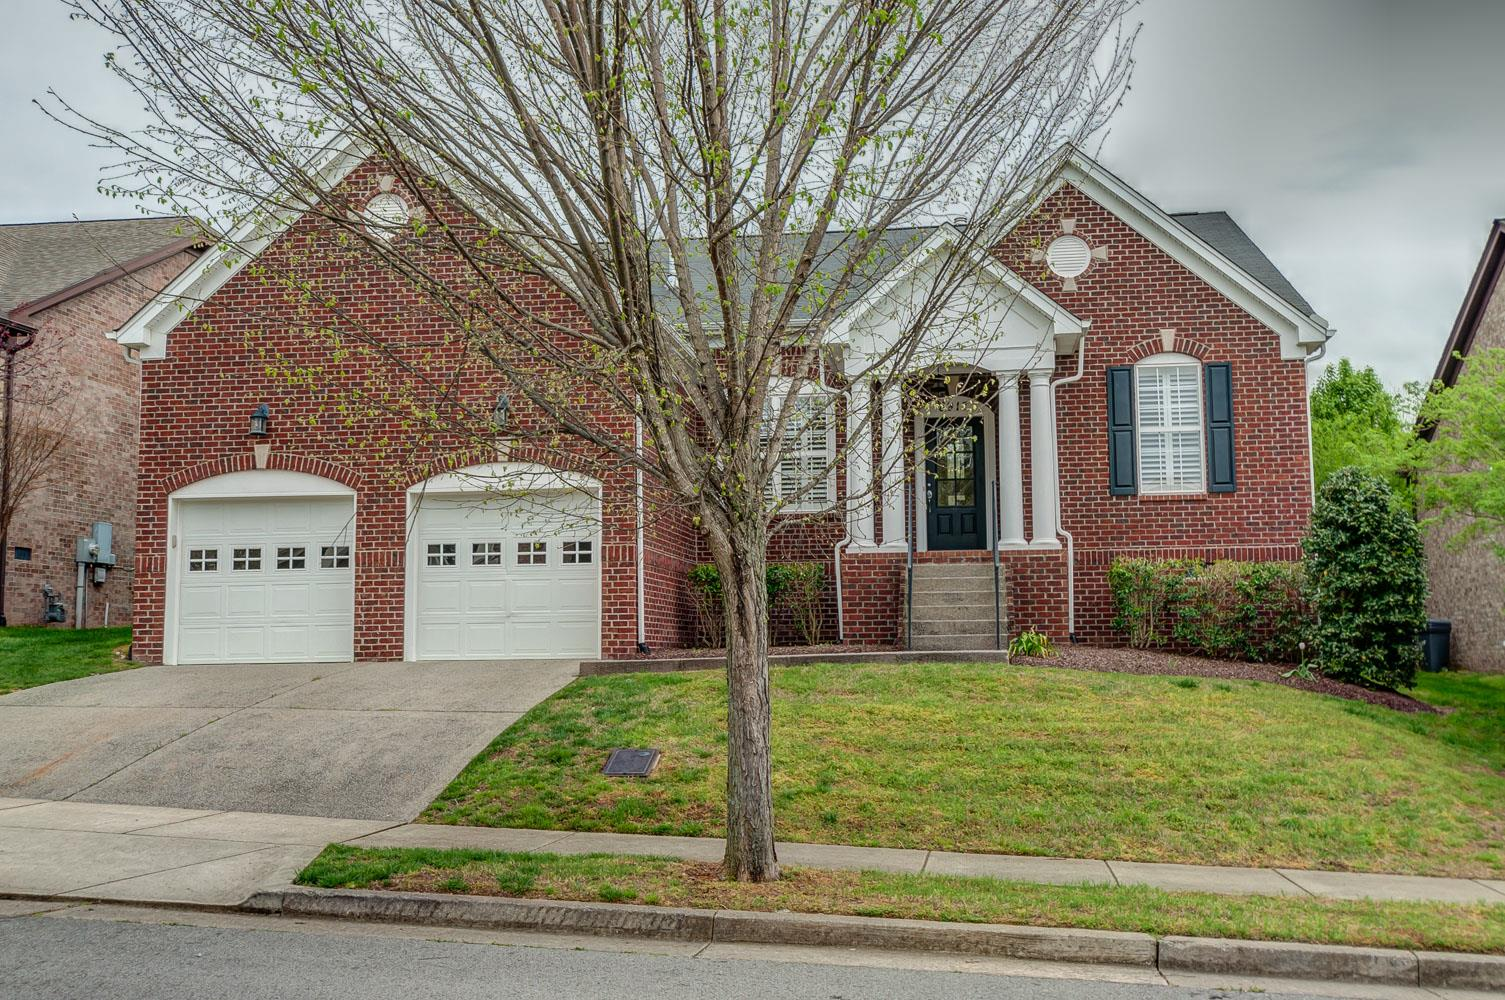 8917 Macauley Ln, Nolensville, TN 37135 - Nolensville, TN real estate listing